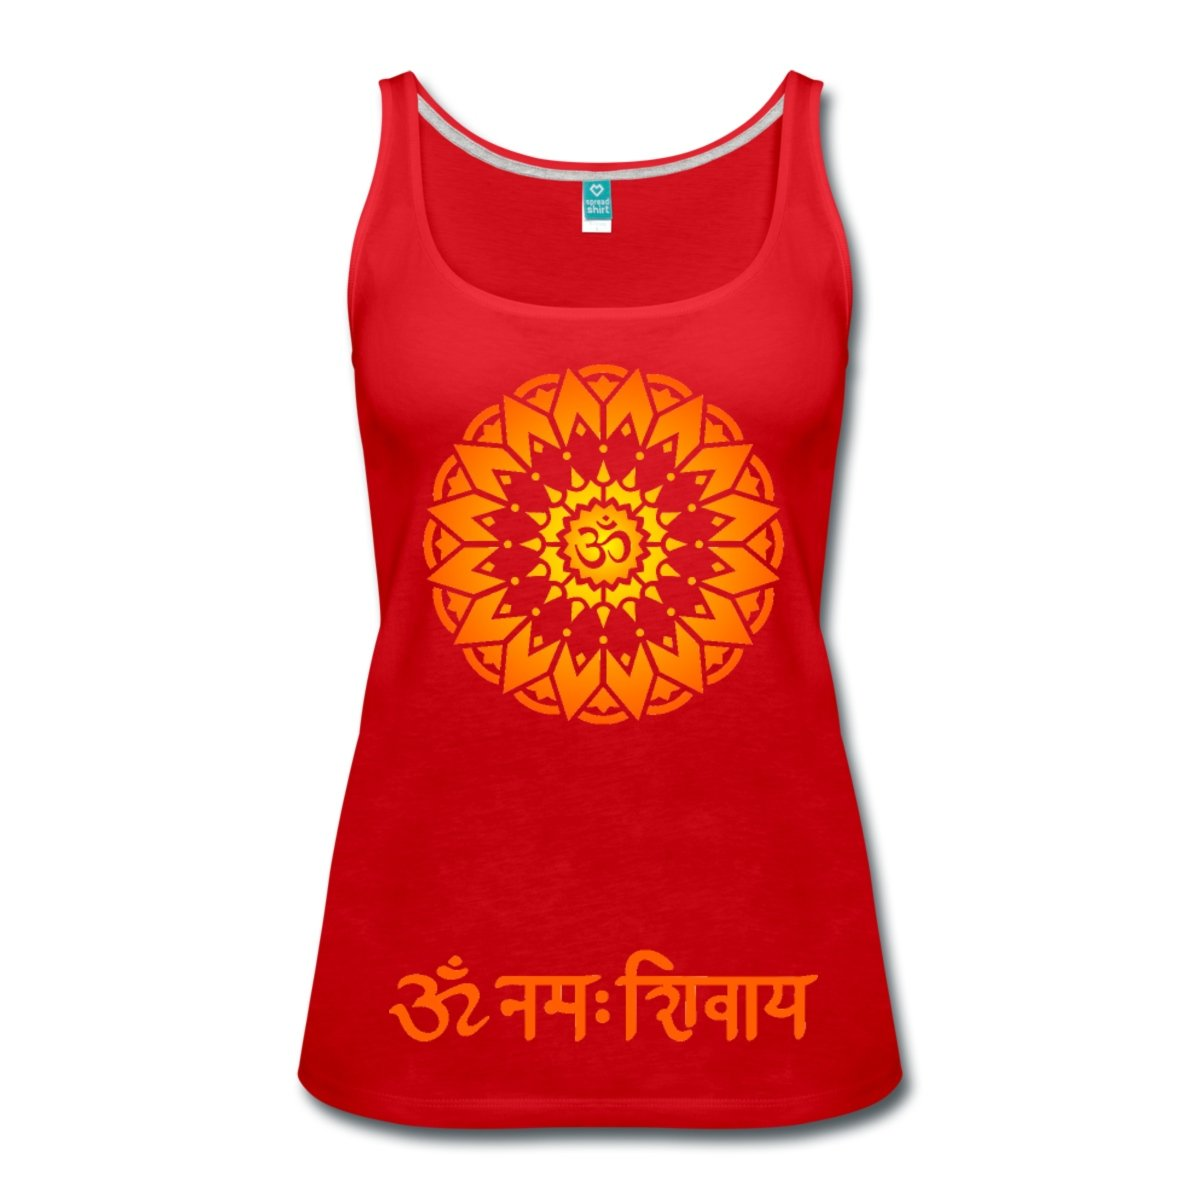 Spreadshirt Om Namah Shivaya Mantra Women's Tank Top S205909-A18228116-1